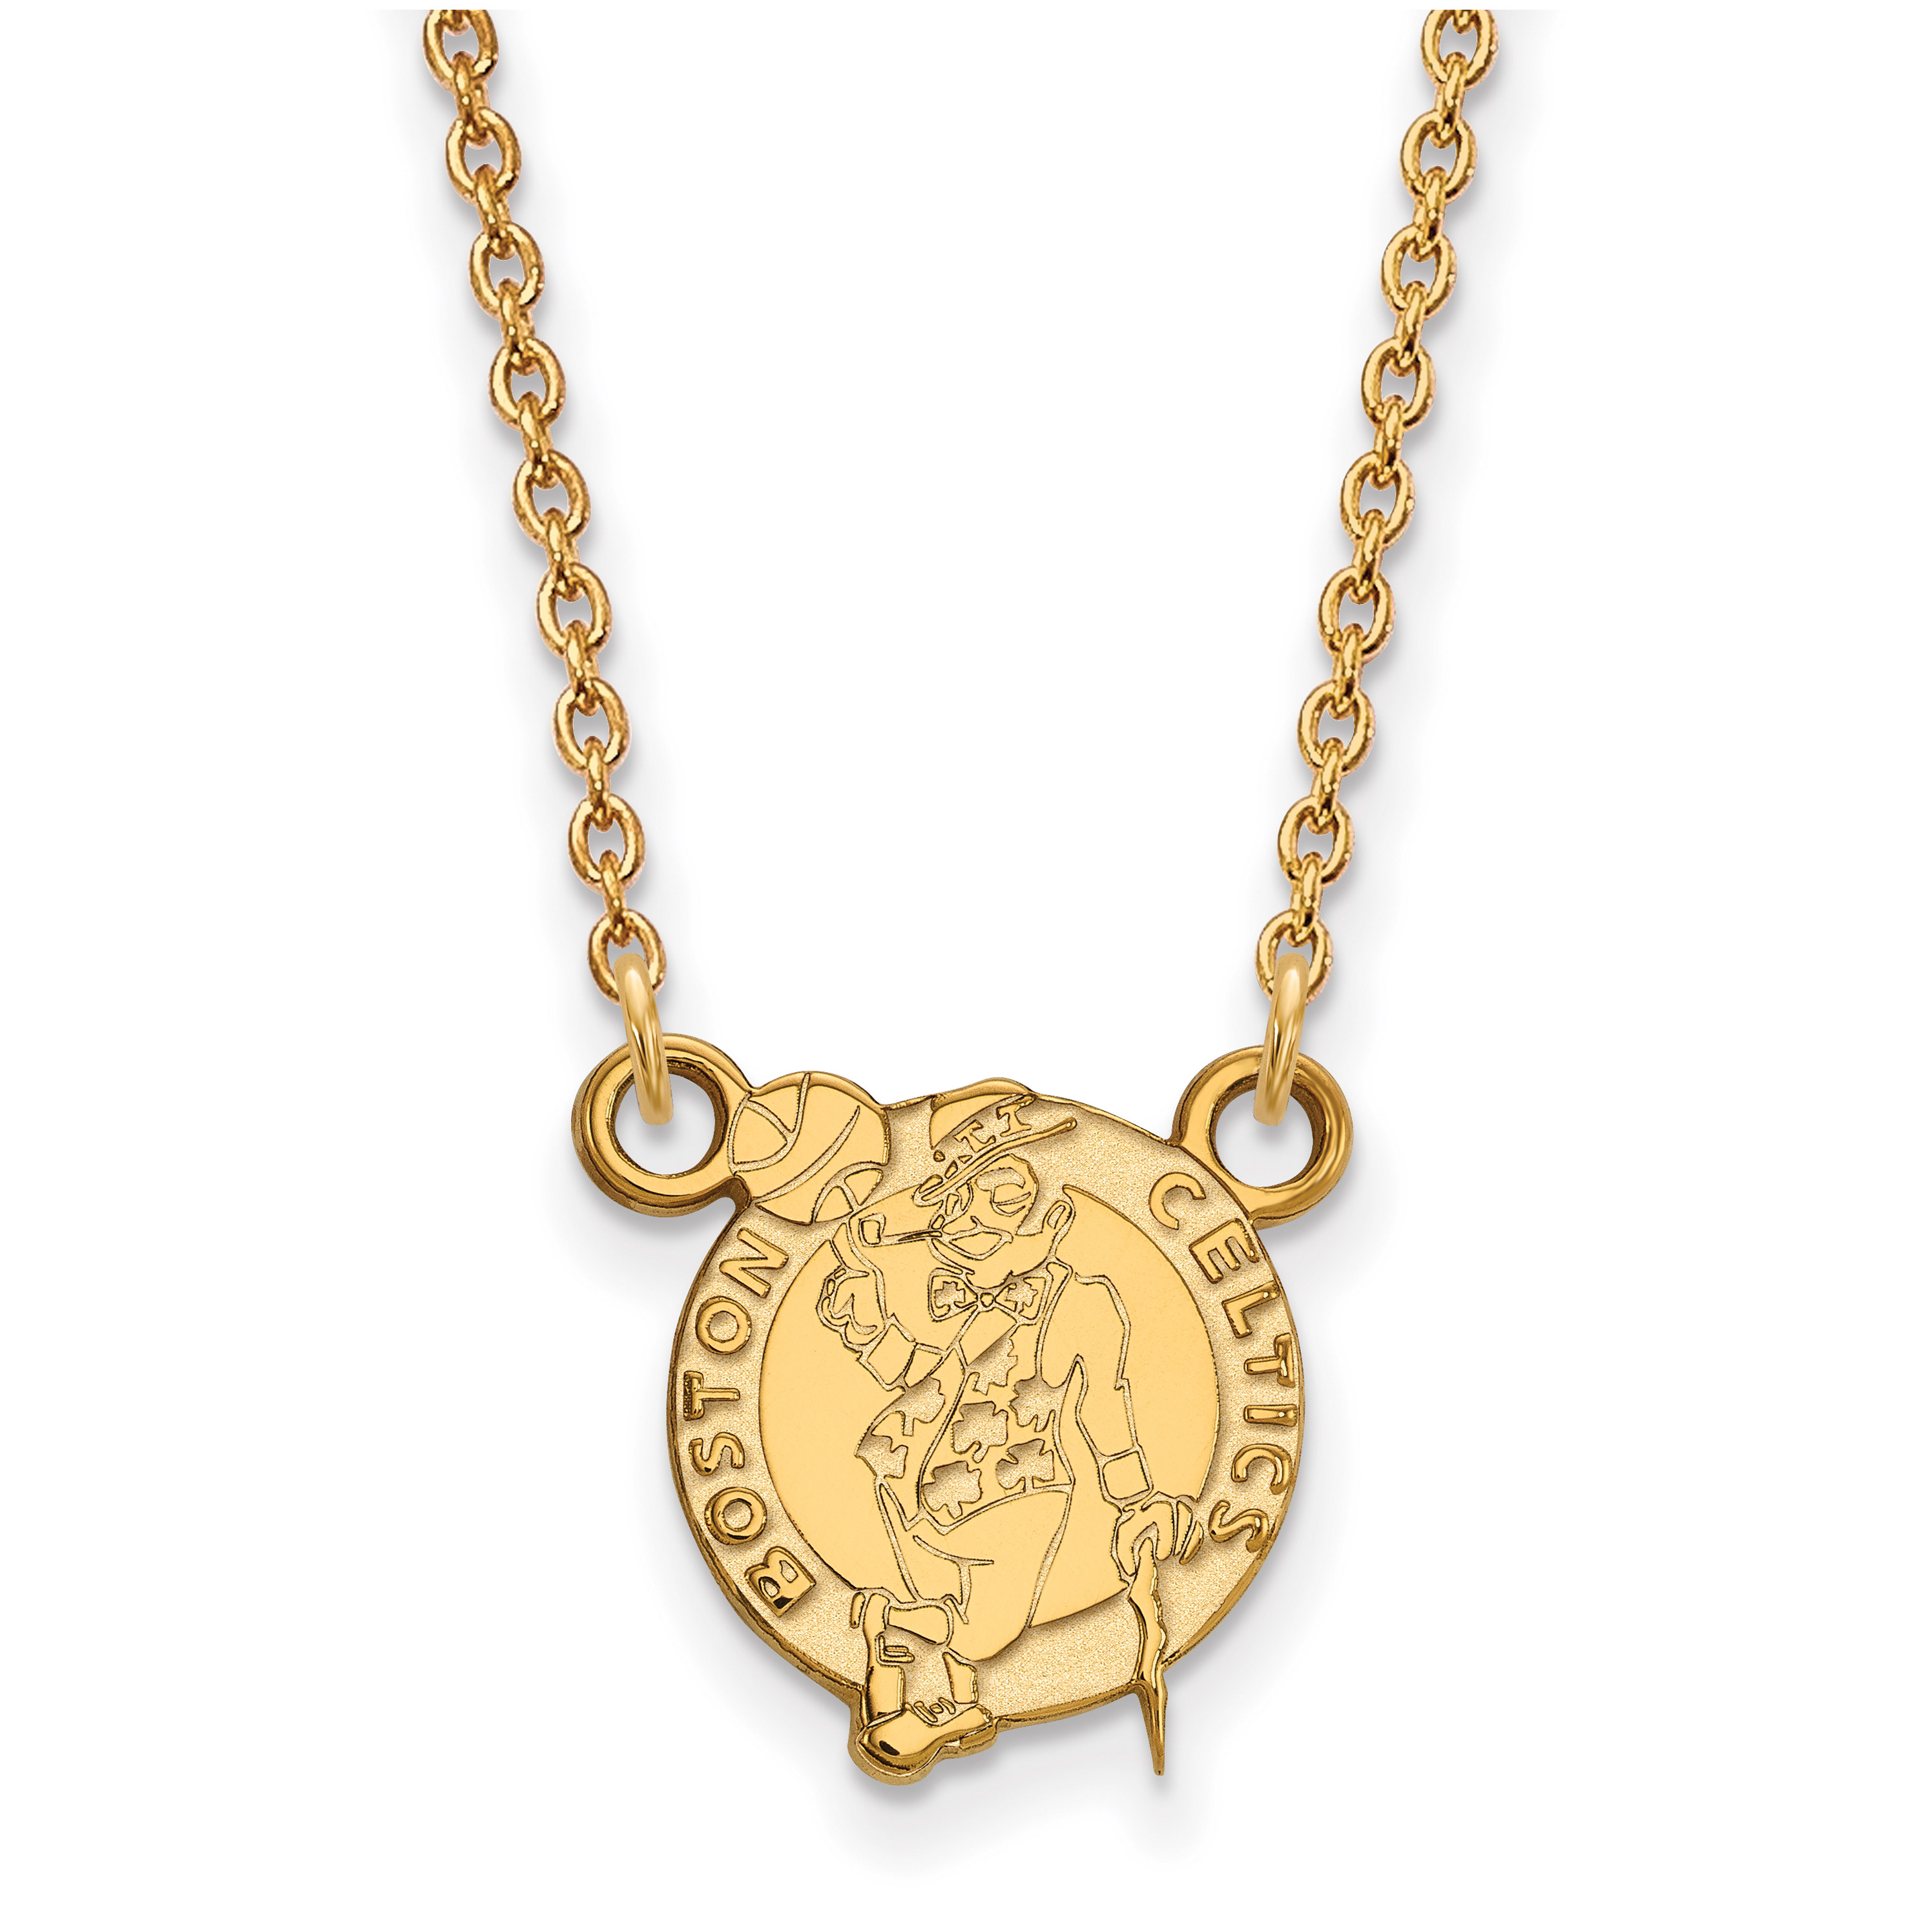 Boston Celtics Women's Gold Plated Pendant Necklace - No Size